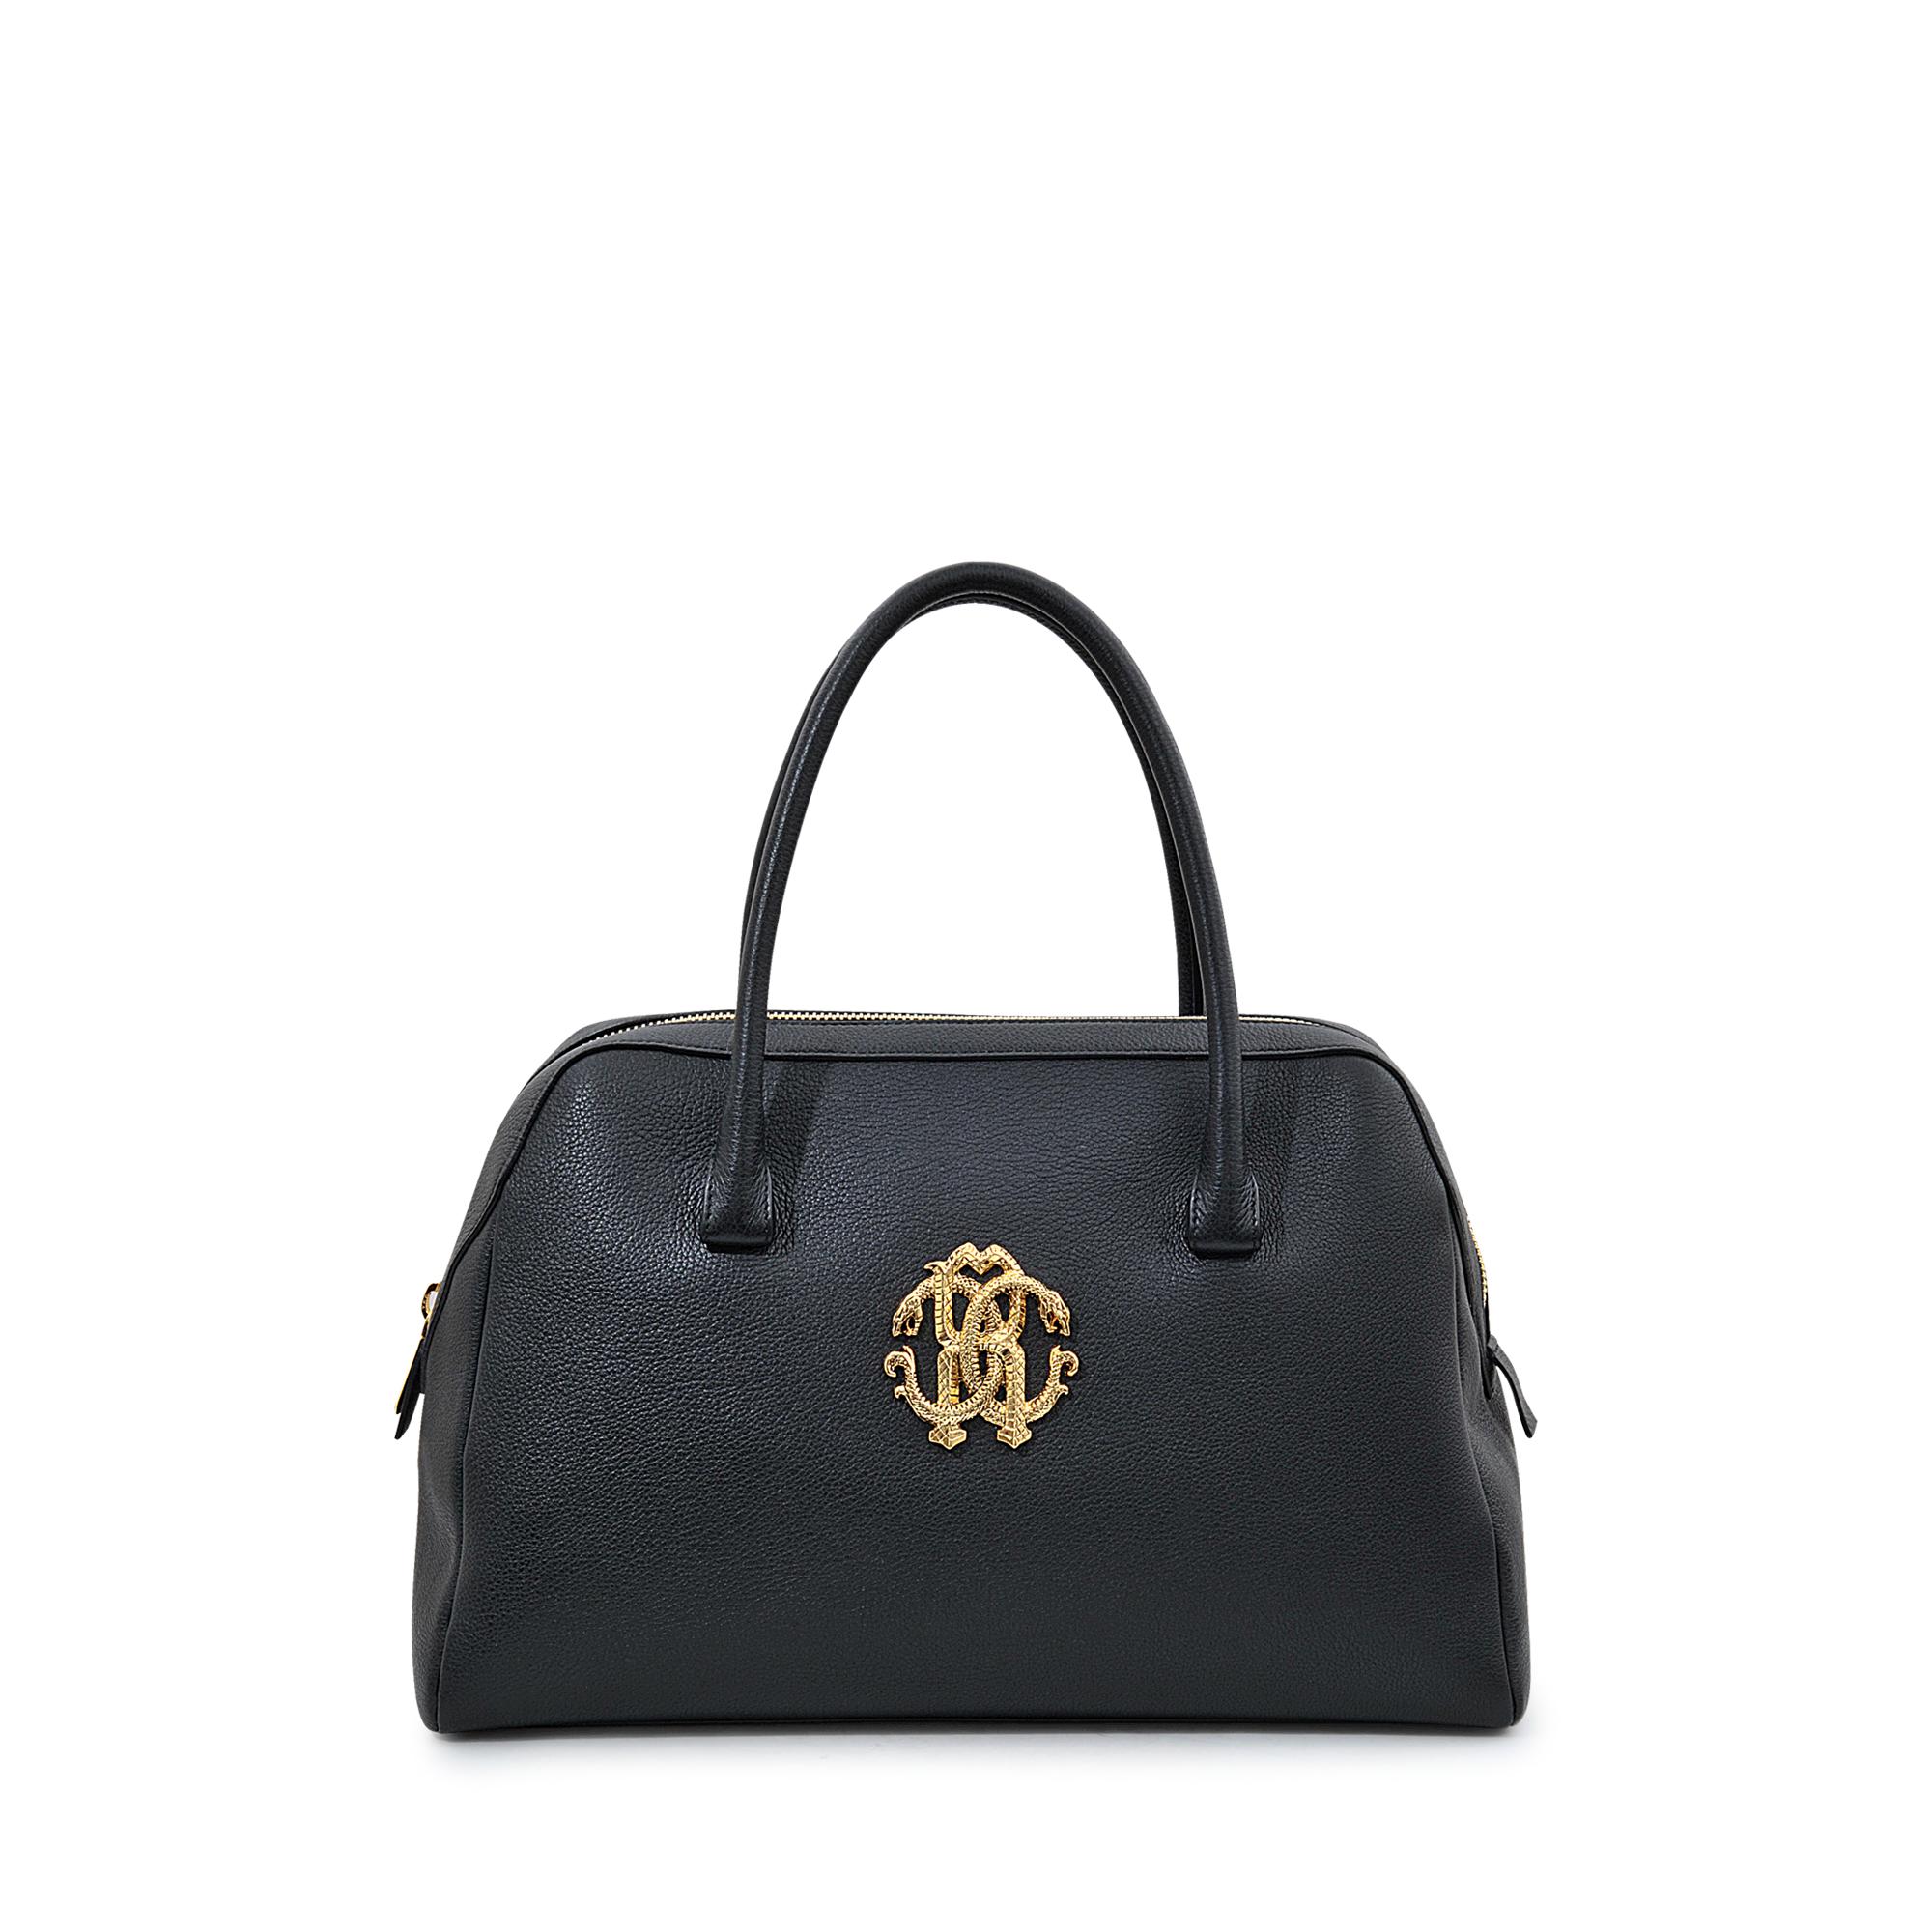 BAGS - Handbags Roberto Cavalli IoQgv4NCi